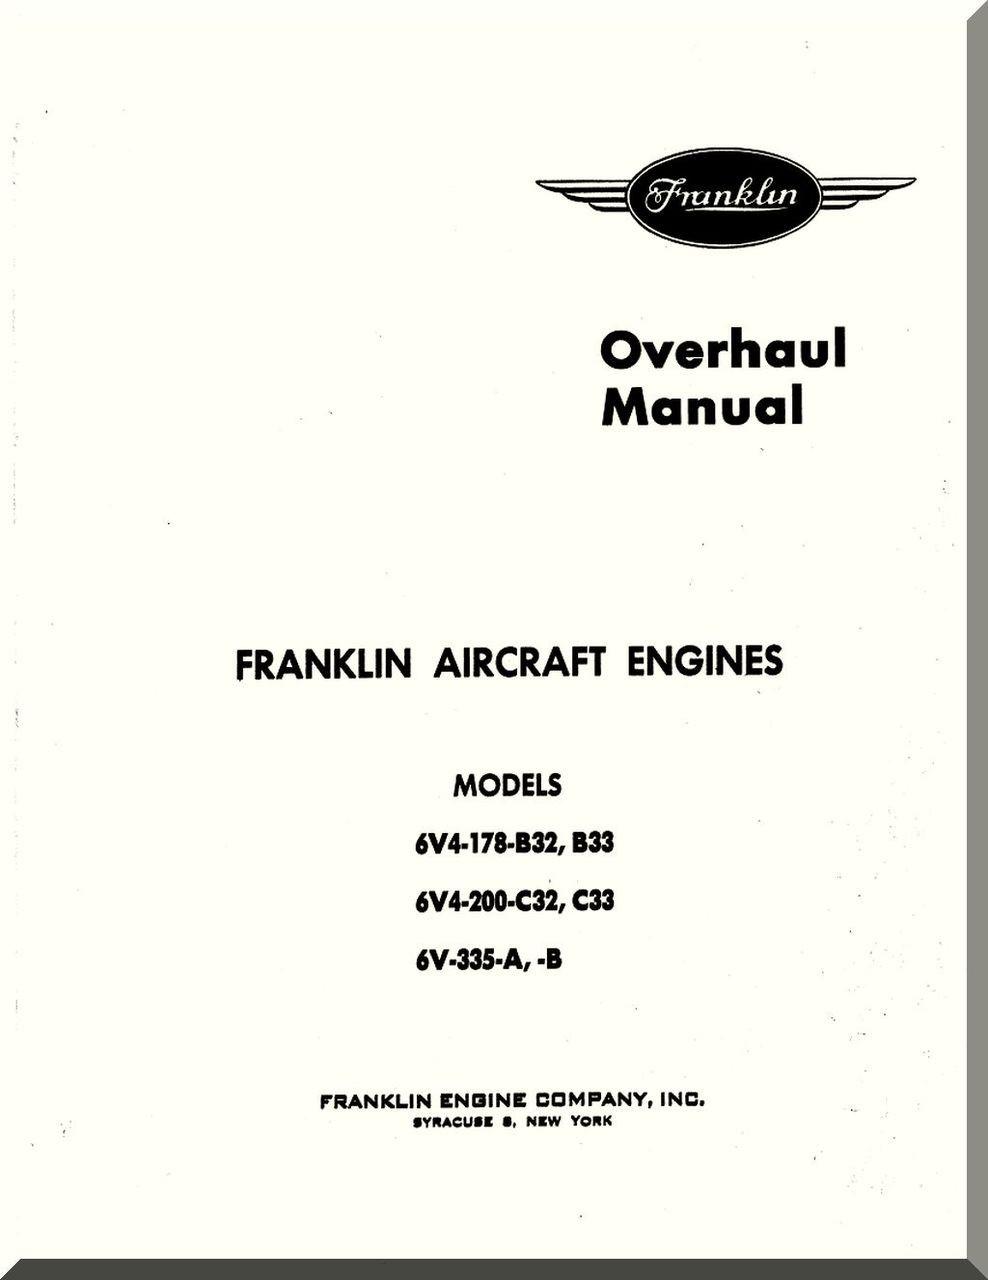 Franklin 6v4 178 b32 b33 6v4 200c32c33 6v 335 ab aircraft image 1 malvernweather Choice Image